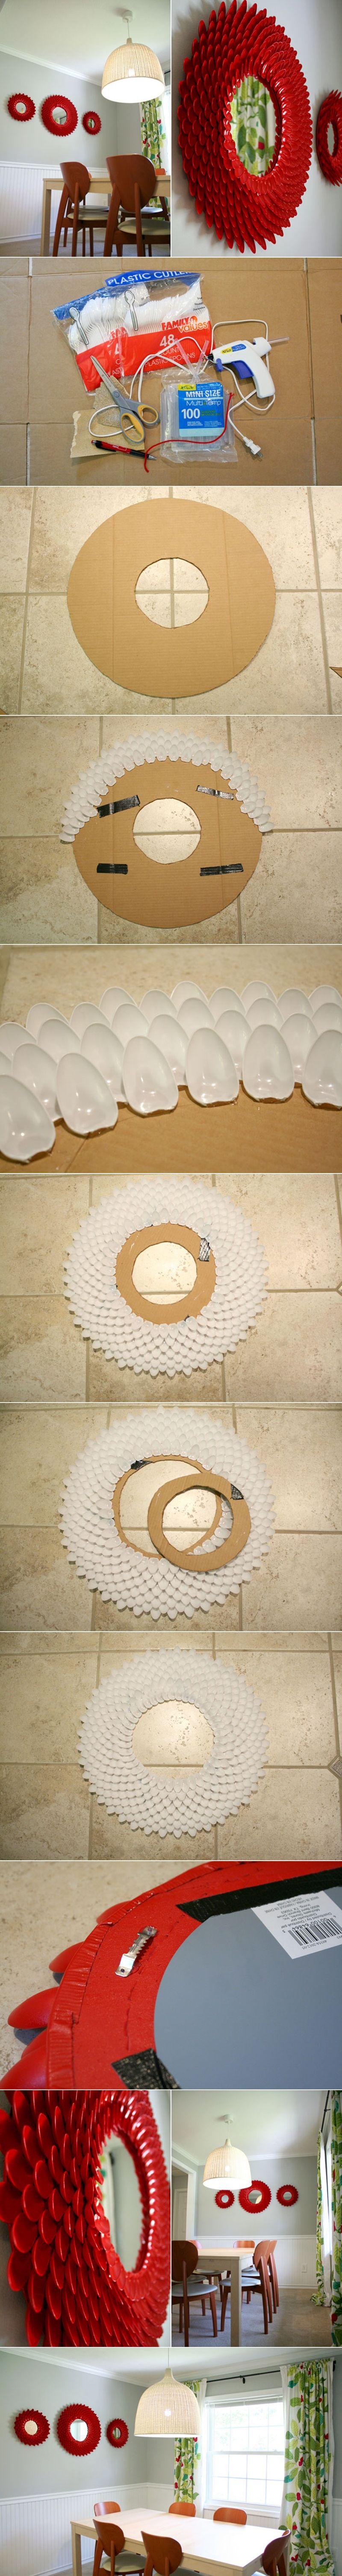 DIY Decorative Chrysanthemum Mirror with Plastic Spoons